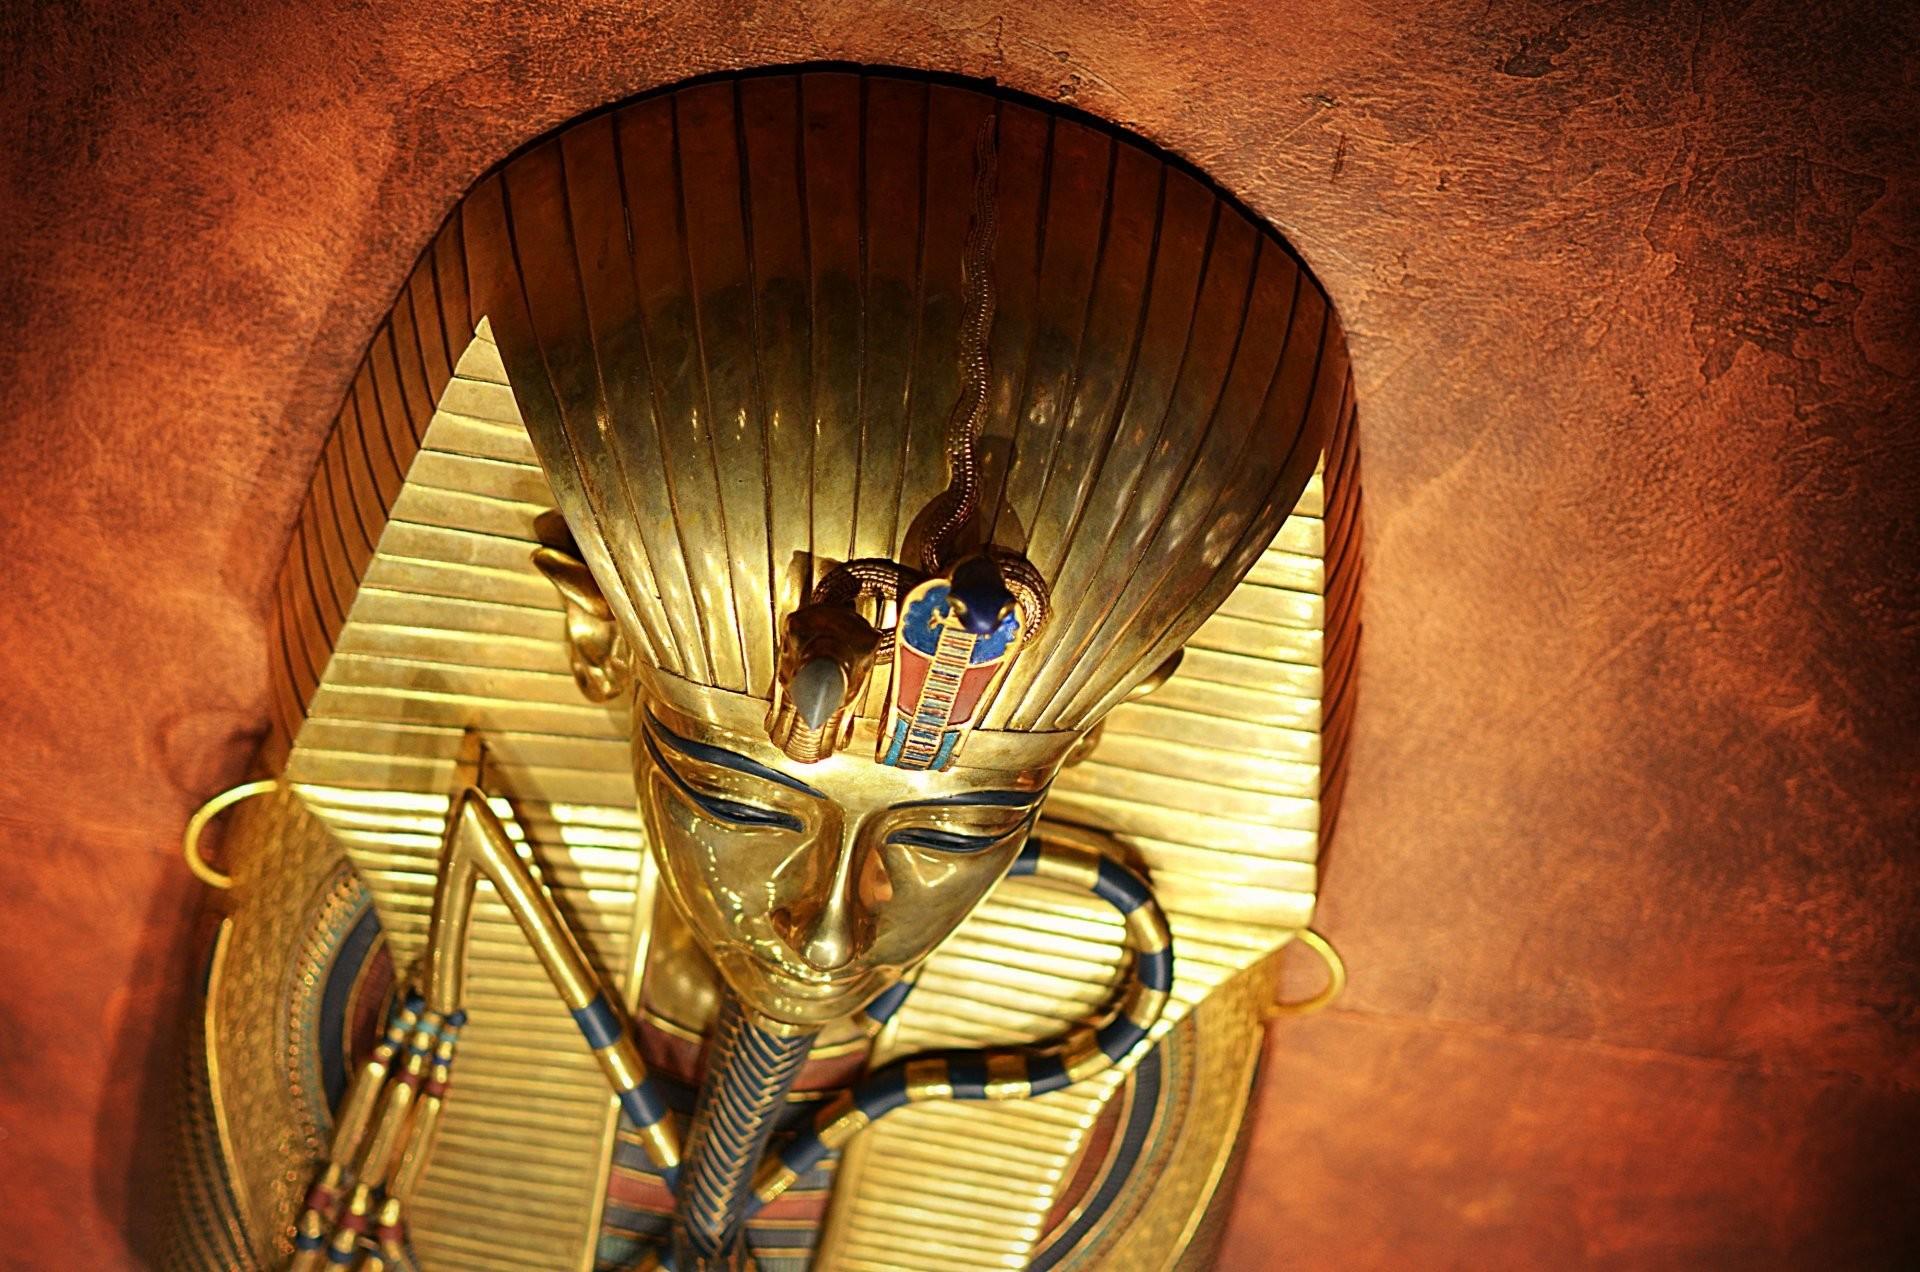 tutankhamun tutankhamun pharaoh ancient egypt mask background